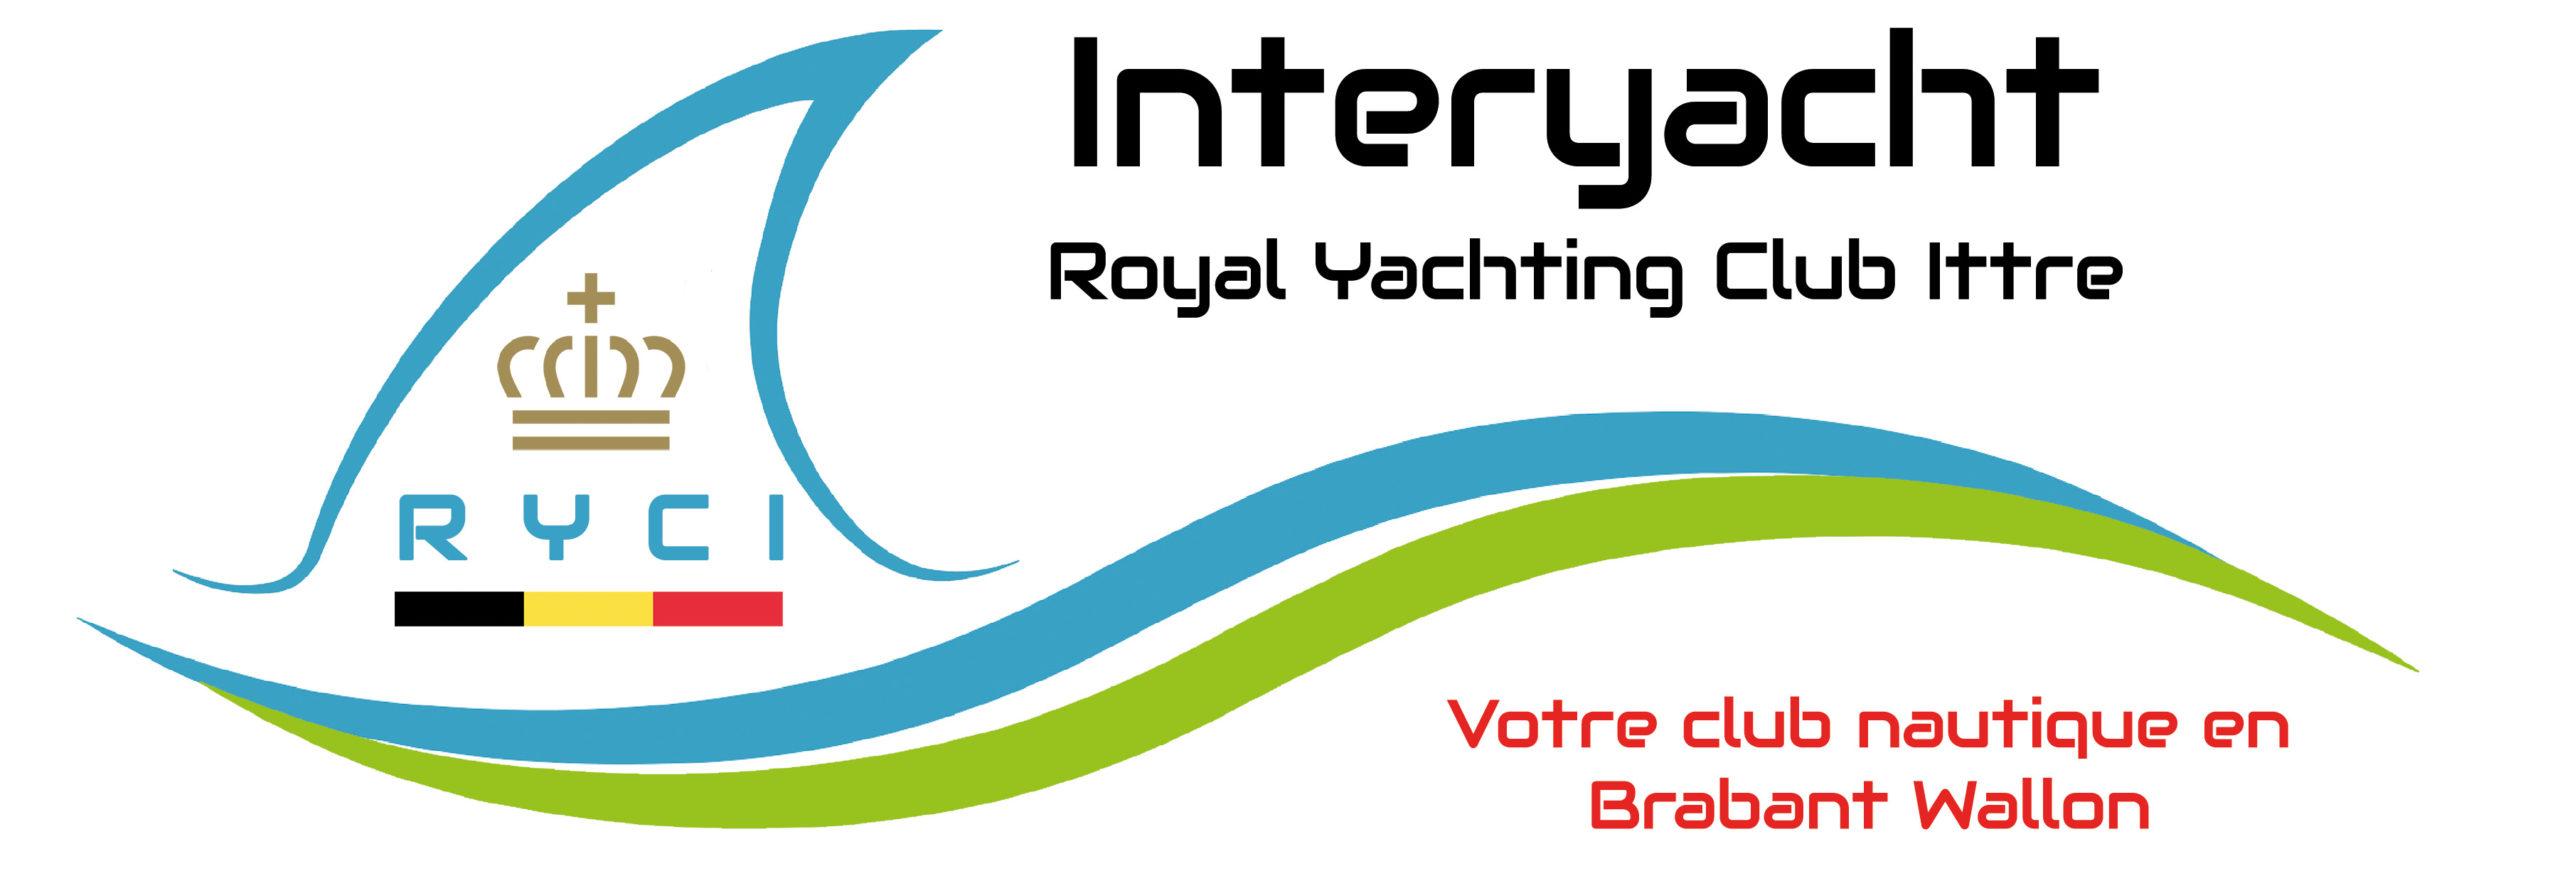 Interyacht - RYCI